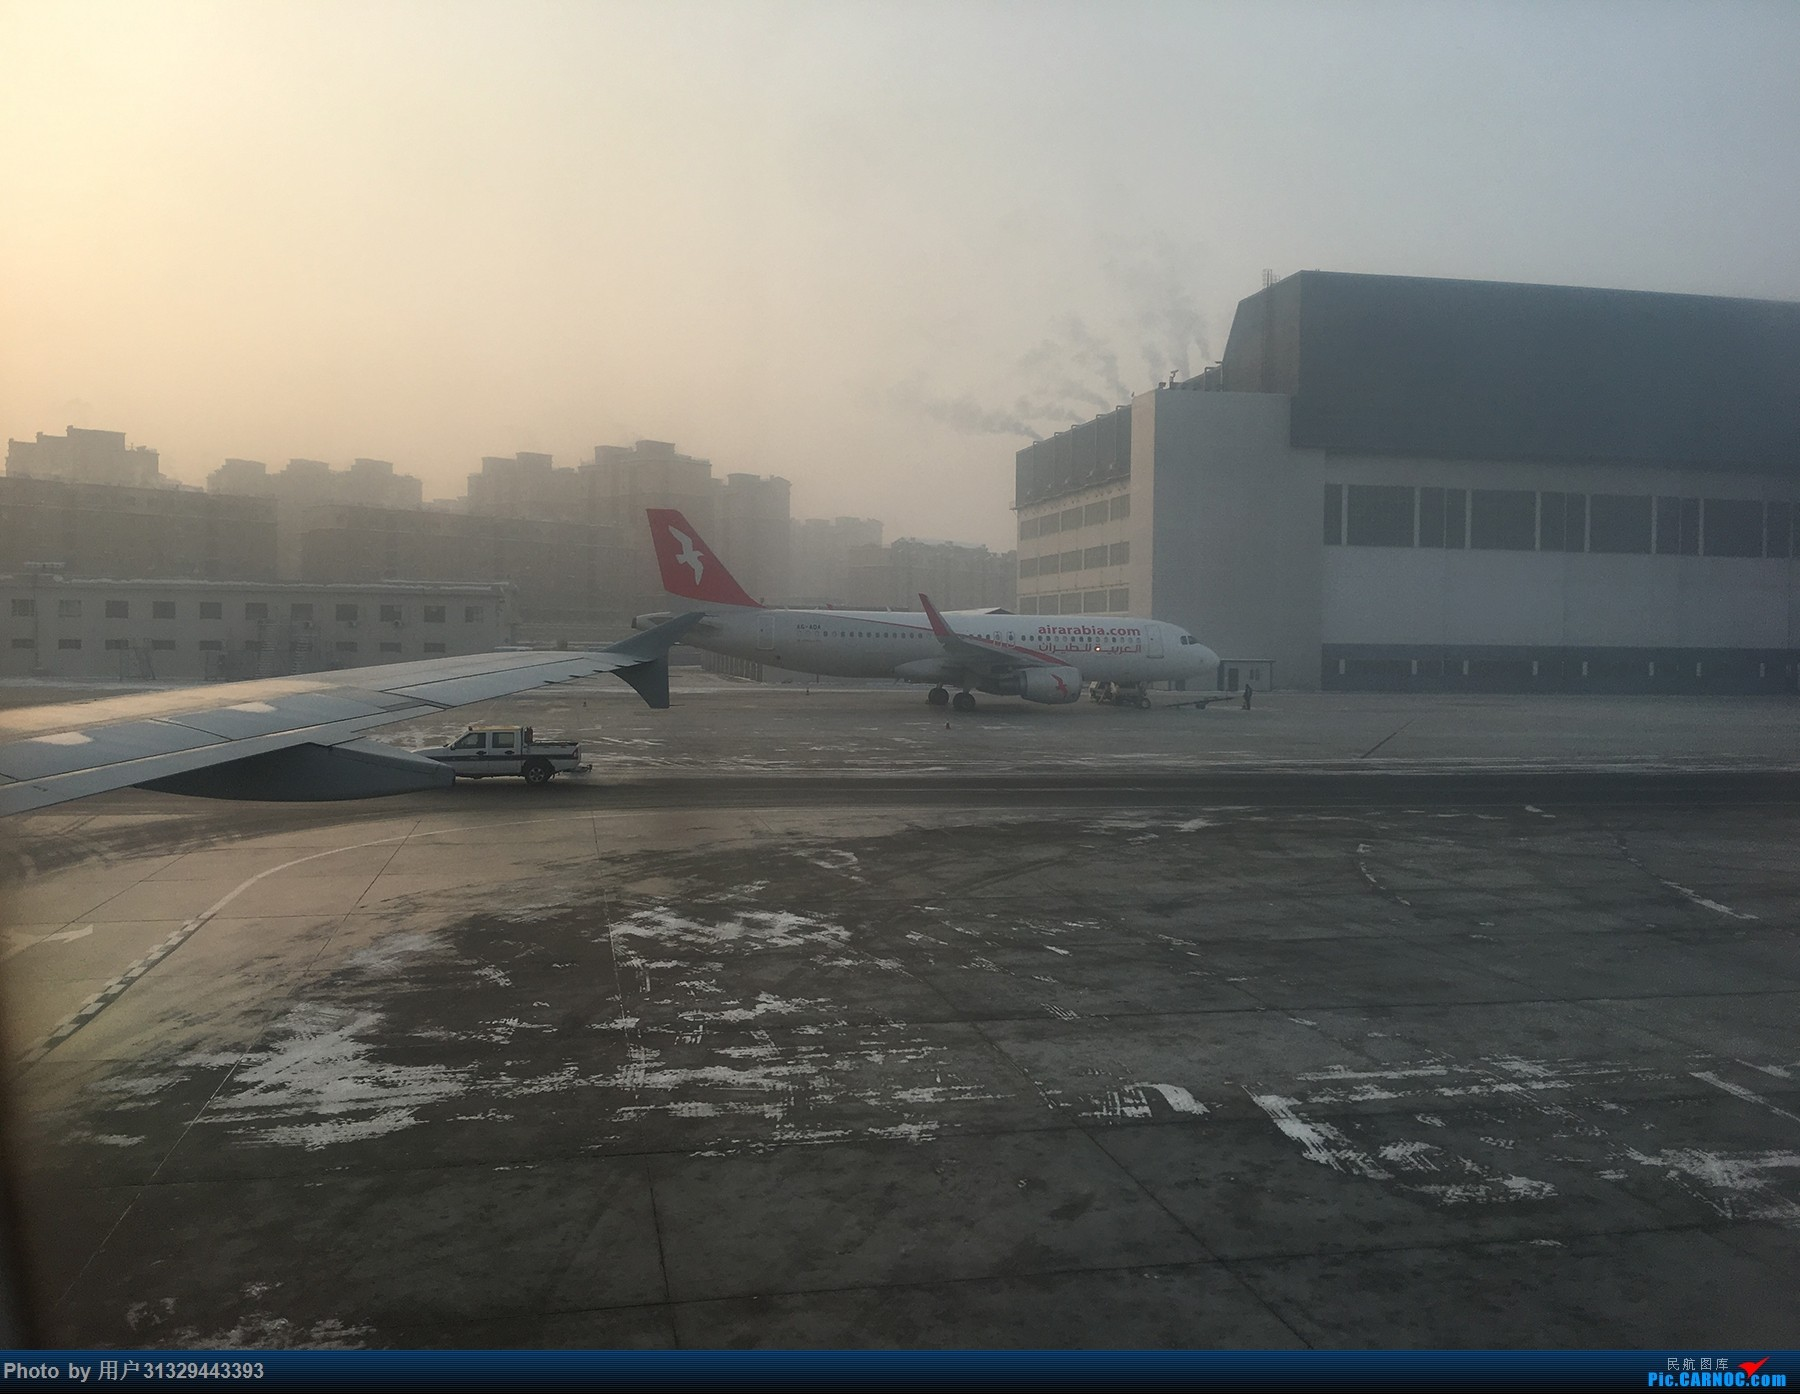 Re:东航疆内航线乌鲁木齐飞哈密体验 AIRBUS A320-200 AG-AQA 乌鲁木齐地窝堡国际机场